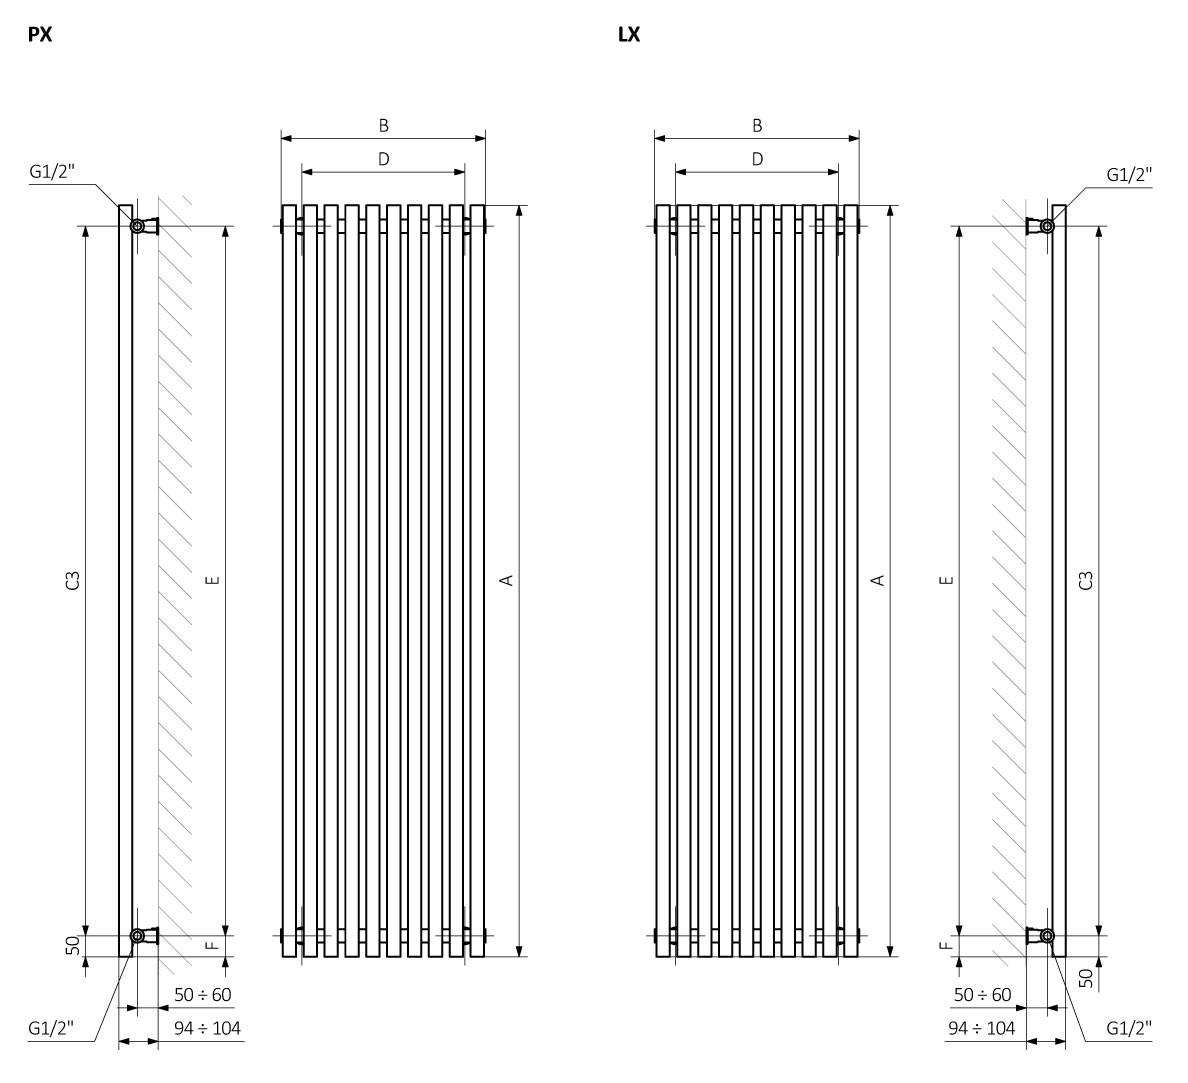 A – высота, B – ширина, C1-C5 – расстояние между осями подключения,  D – расстояние между осями крепежей по горизонтали, E – расстояние между осями крепежей по вертикали, F – расстояние от оси нижнего крепежа до нижнего края коллектора.